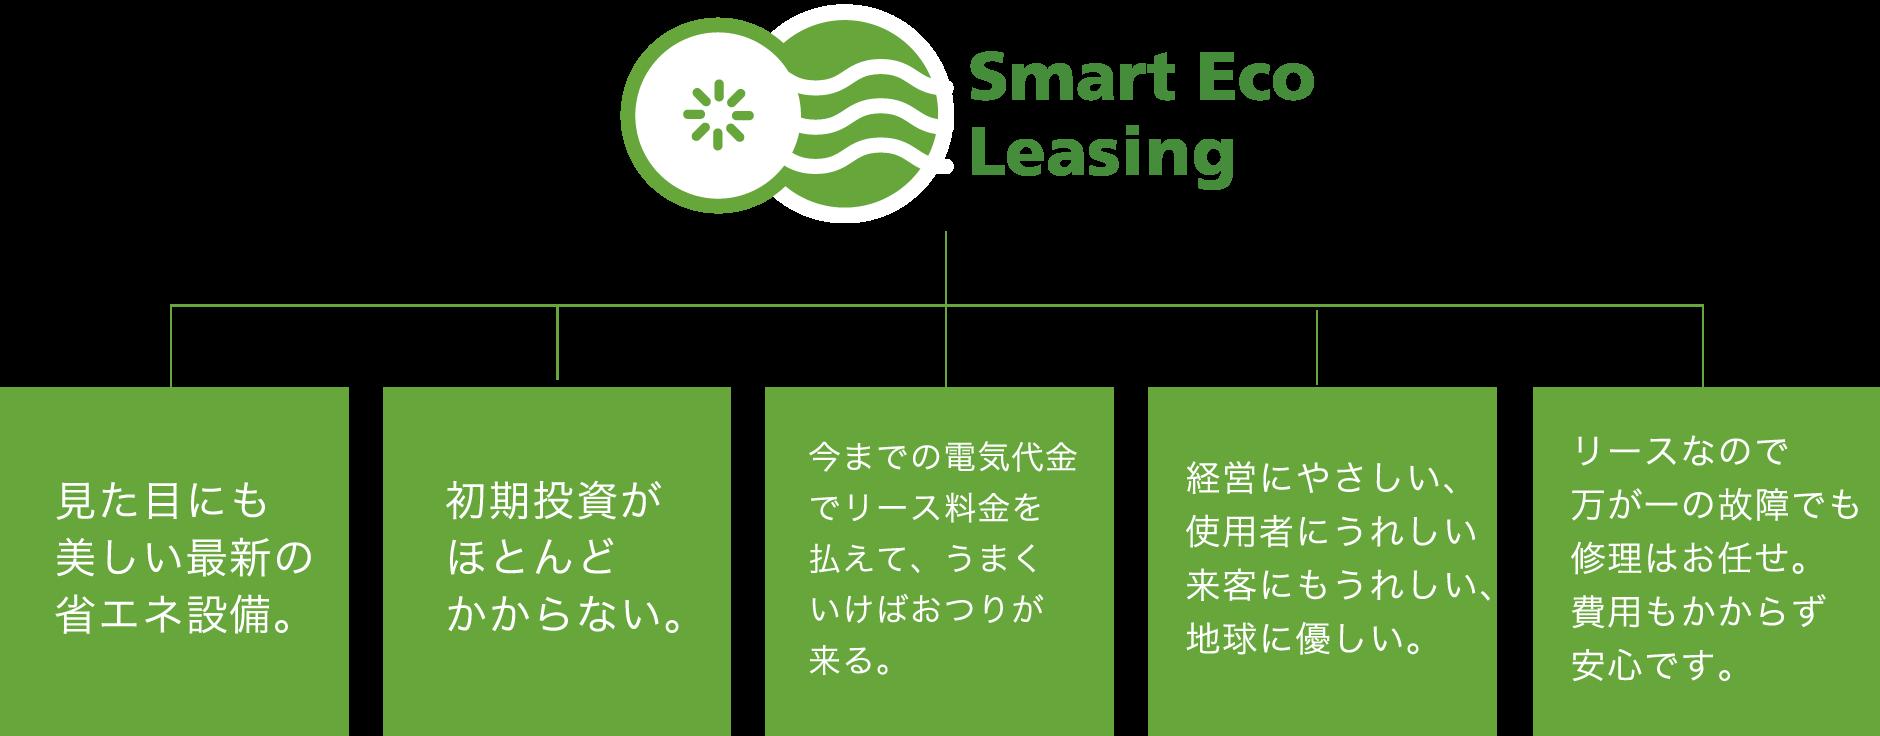 Smart Eco Leasing